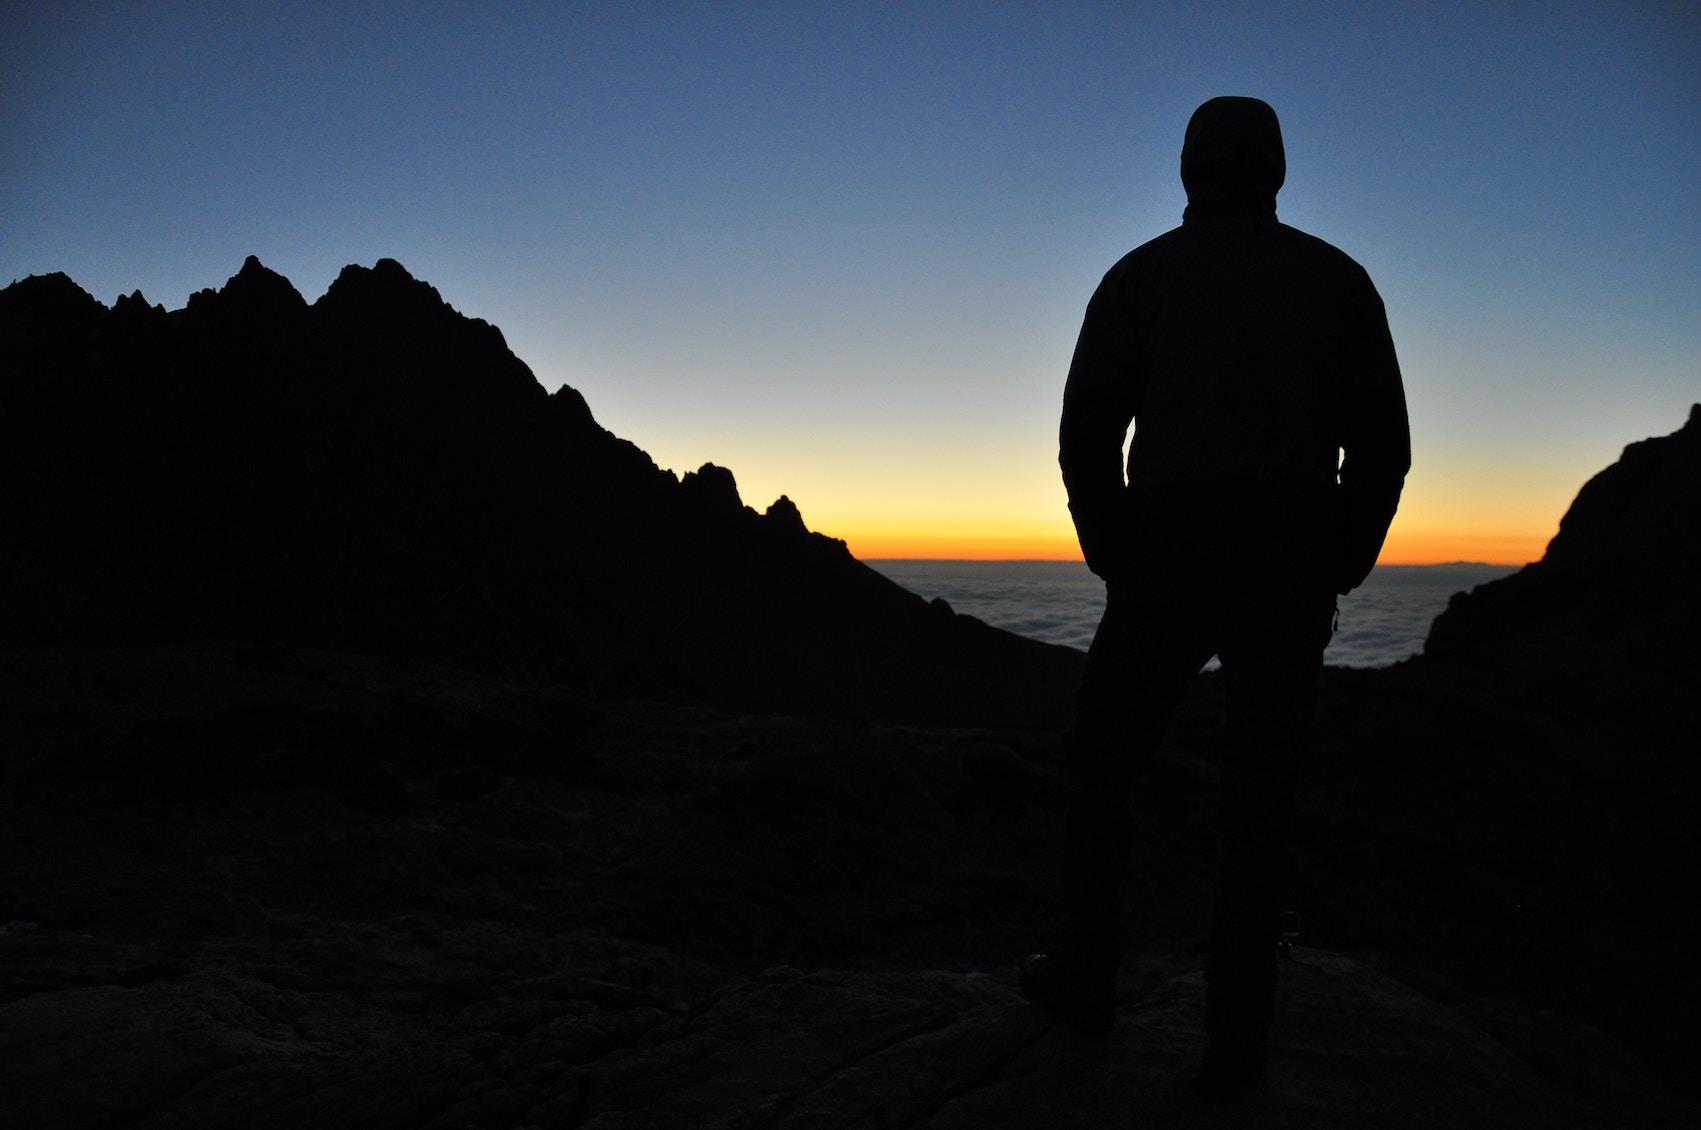 Man Overlooking Ocean Through Mountains